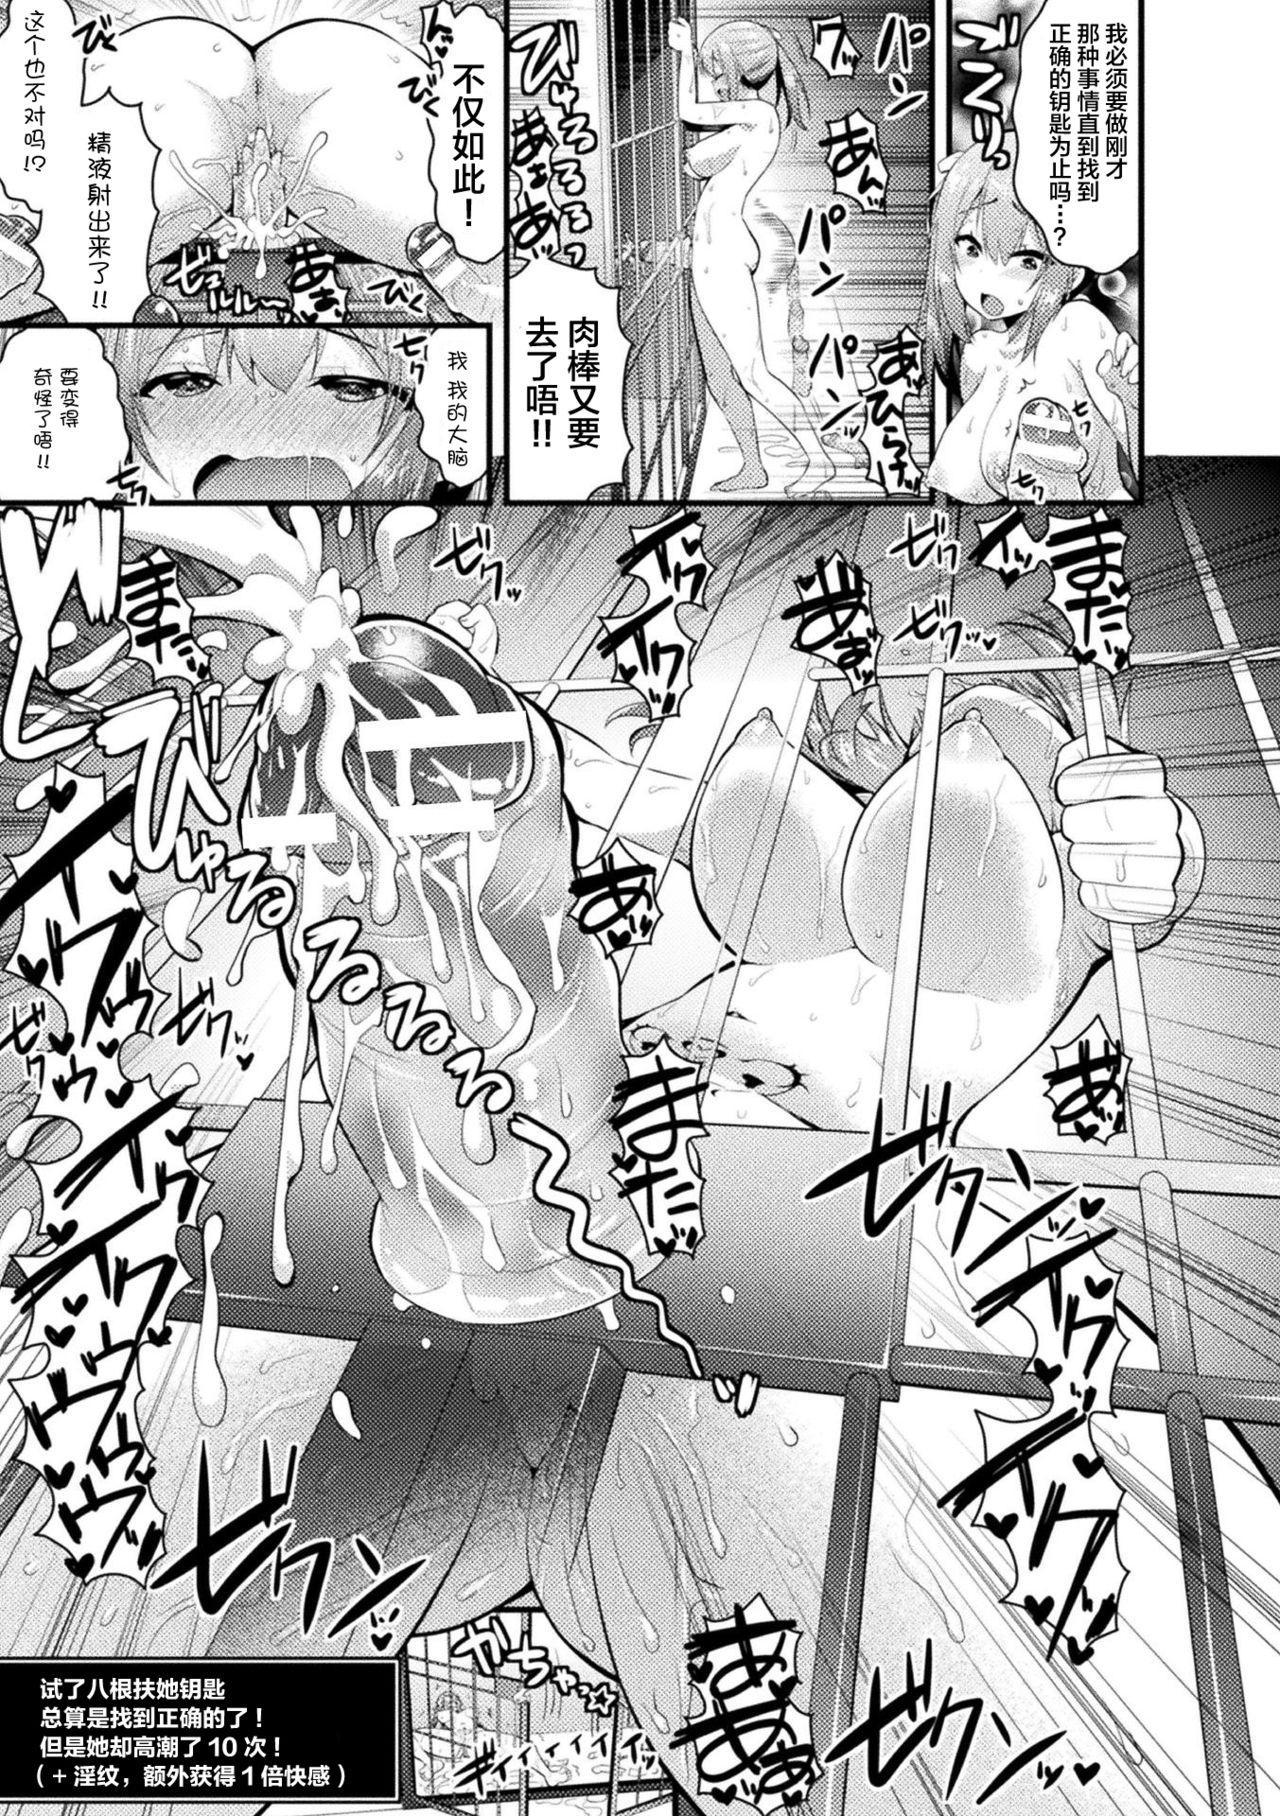 2D Comic Magazine Zecchou Kairaku ga Tomaranai Ero-Trap Dungeon Vol. 1 54